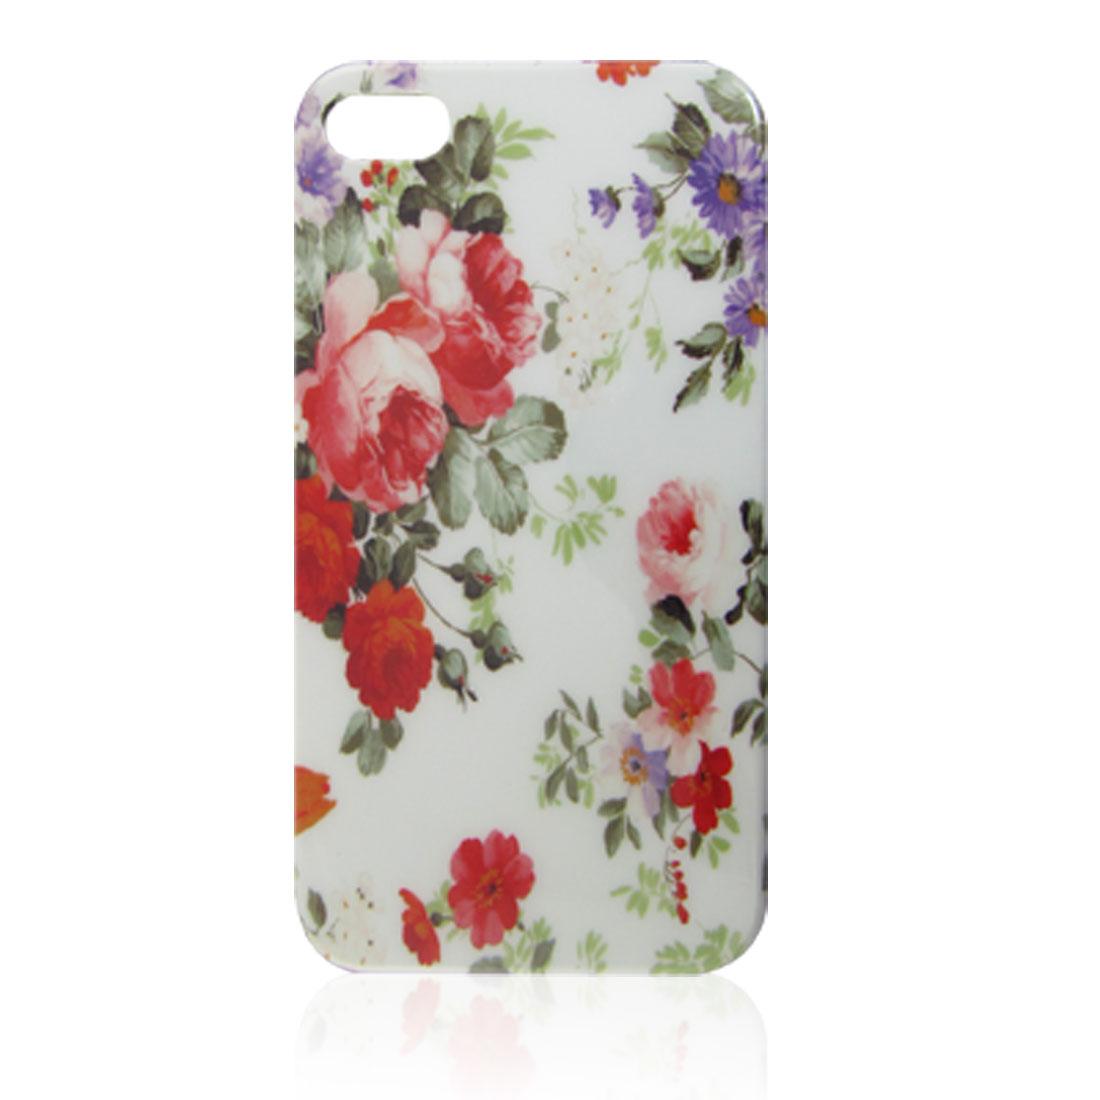 Flower Leaf Print IMD Hard Plastic Back Cover for iPhone 4 4G 4S